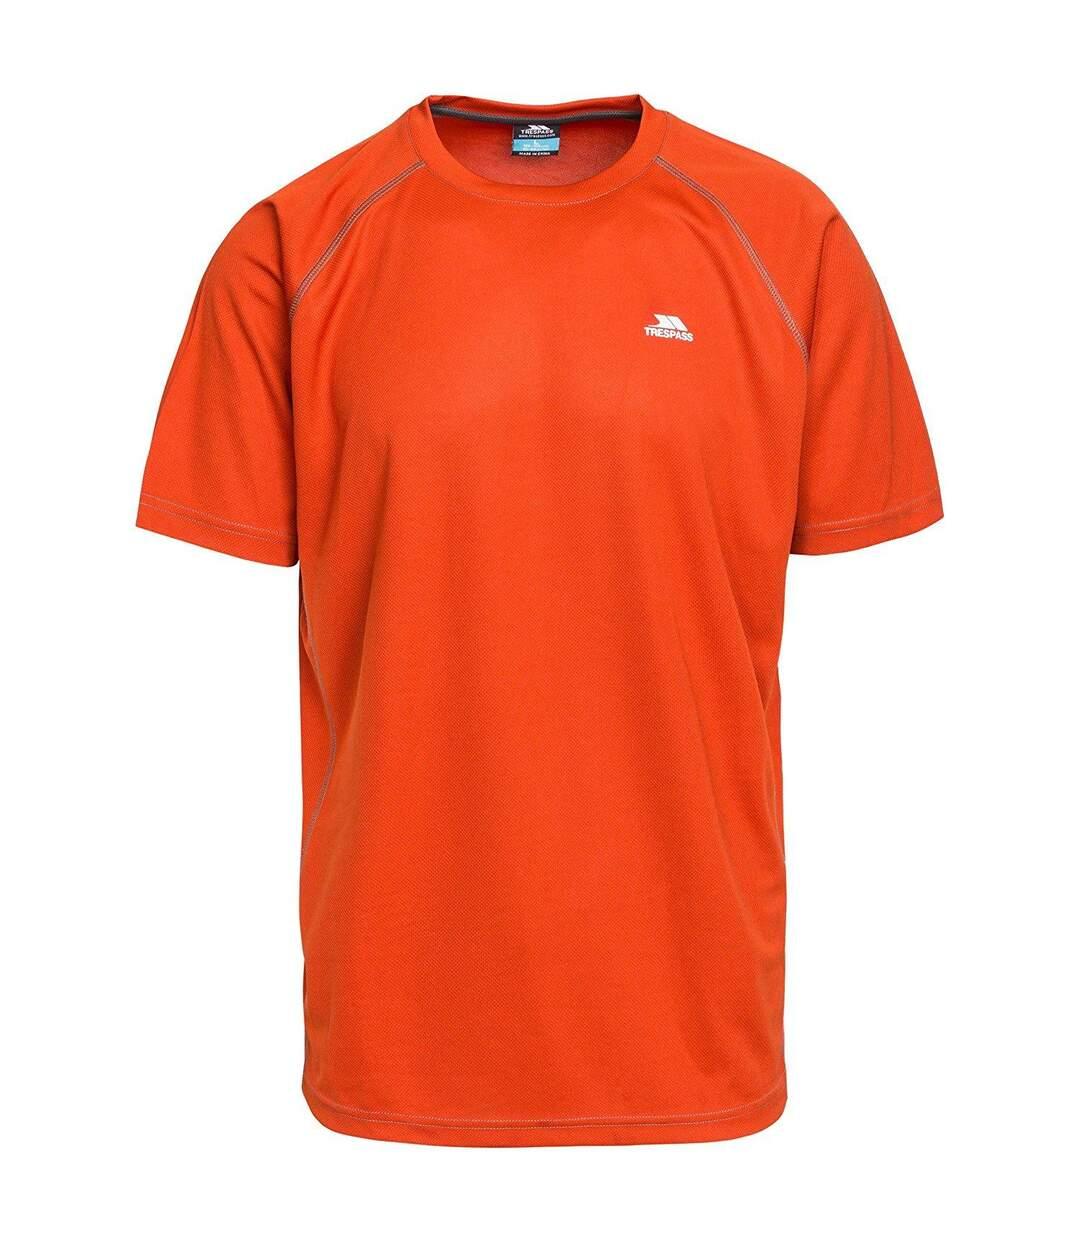 Trespass - T-shirt ACTIVE - Homme (Orange) - UTTP2922